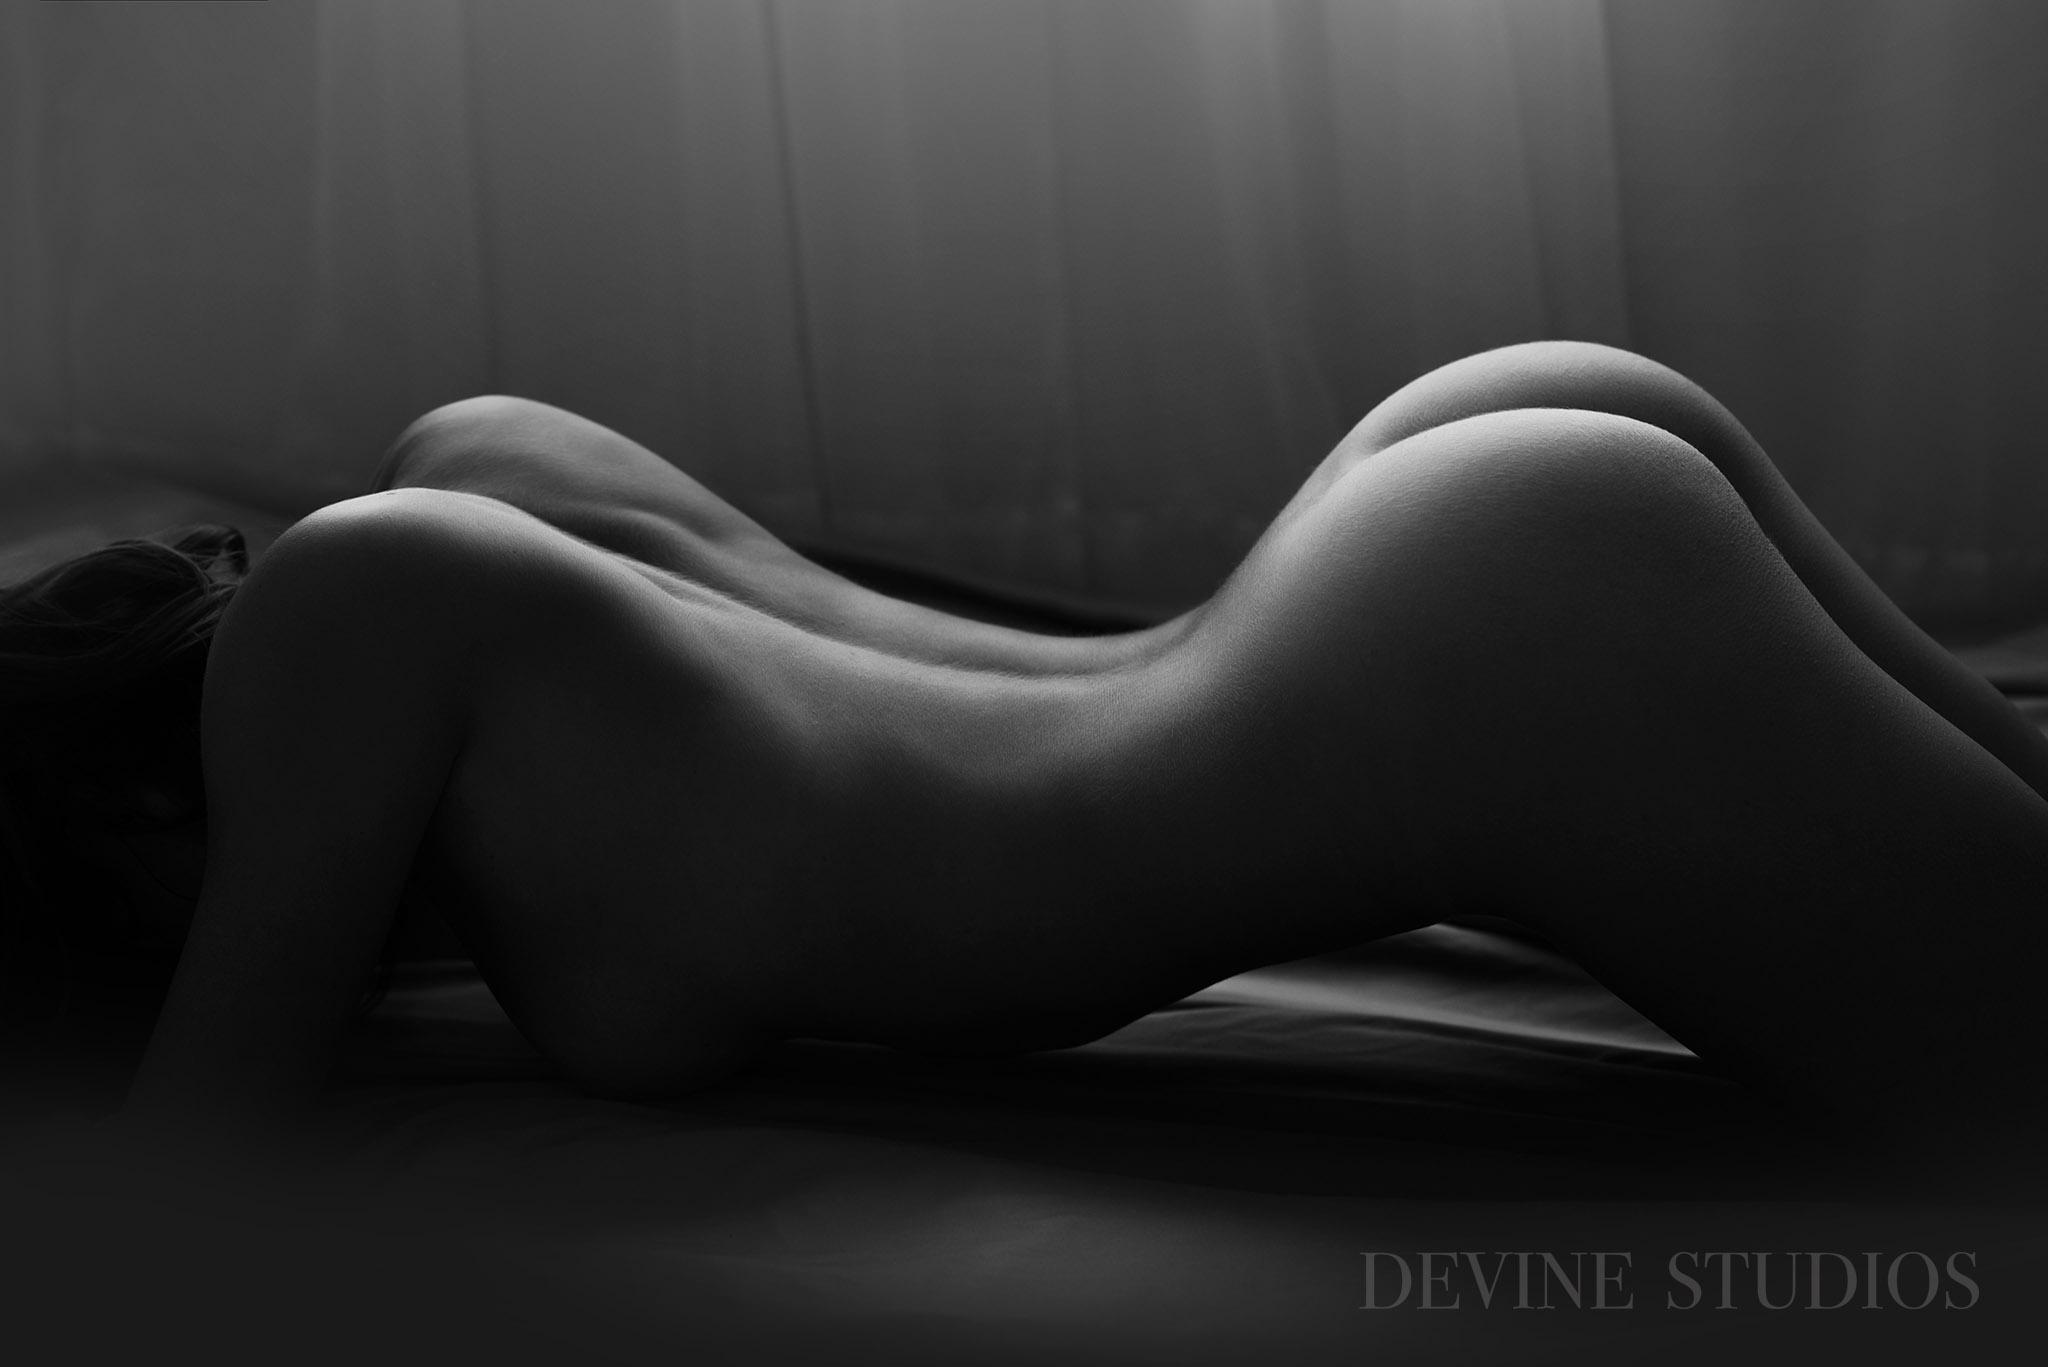 http://devinestudios.com/boudoir/wp-content/uploads/2016/11/Best-boudoir-kansas-city-missouri-photographer-5.jpg